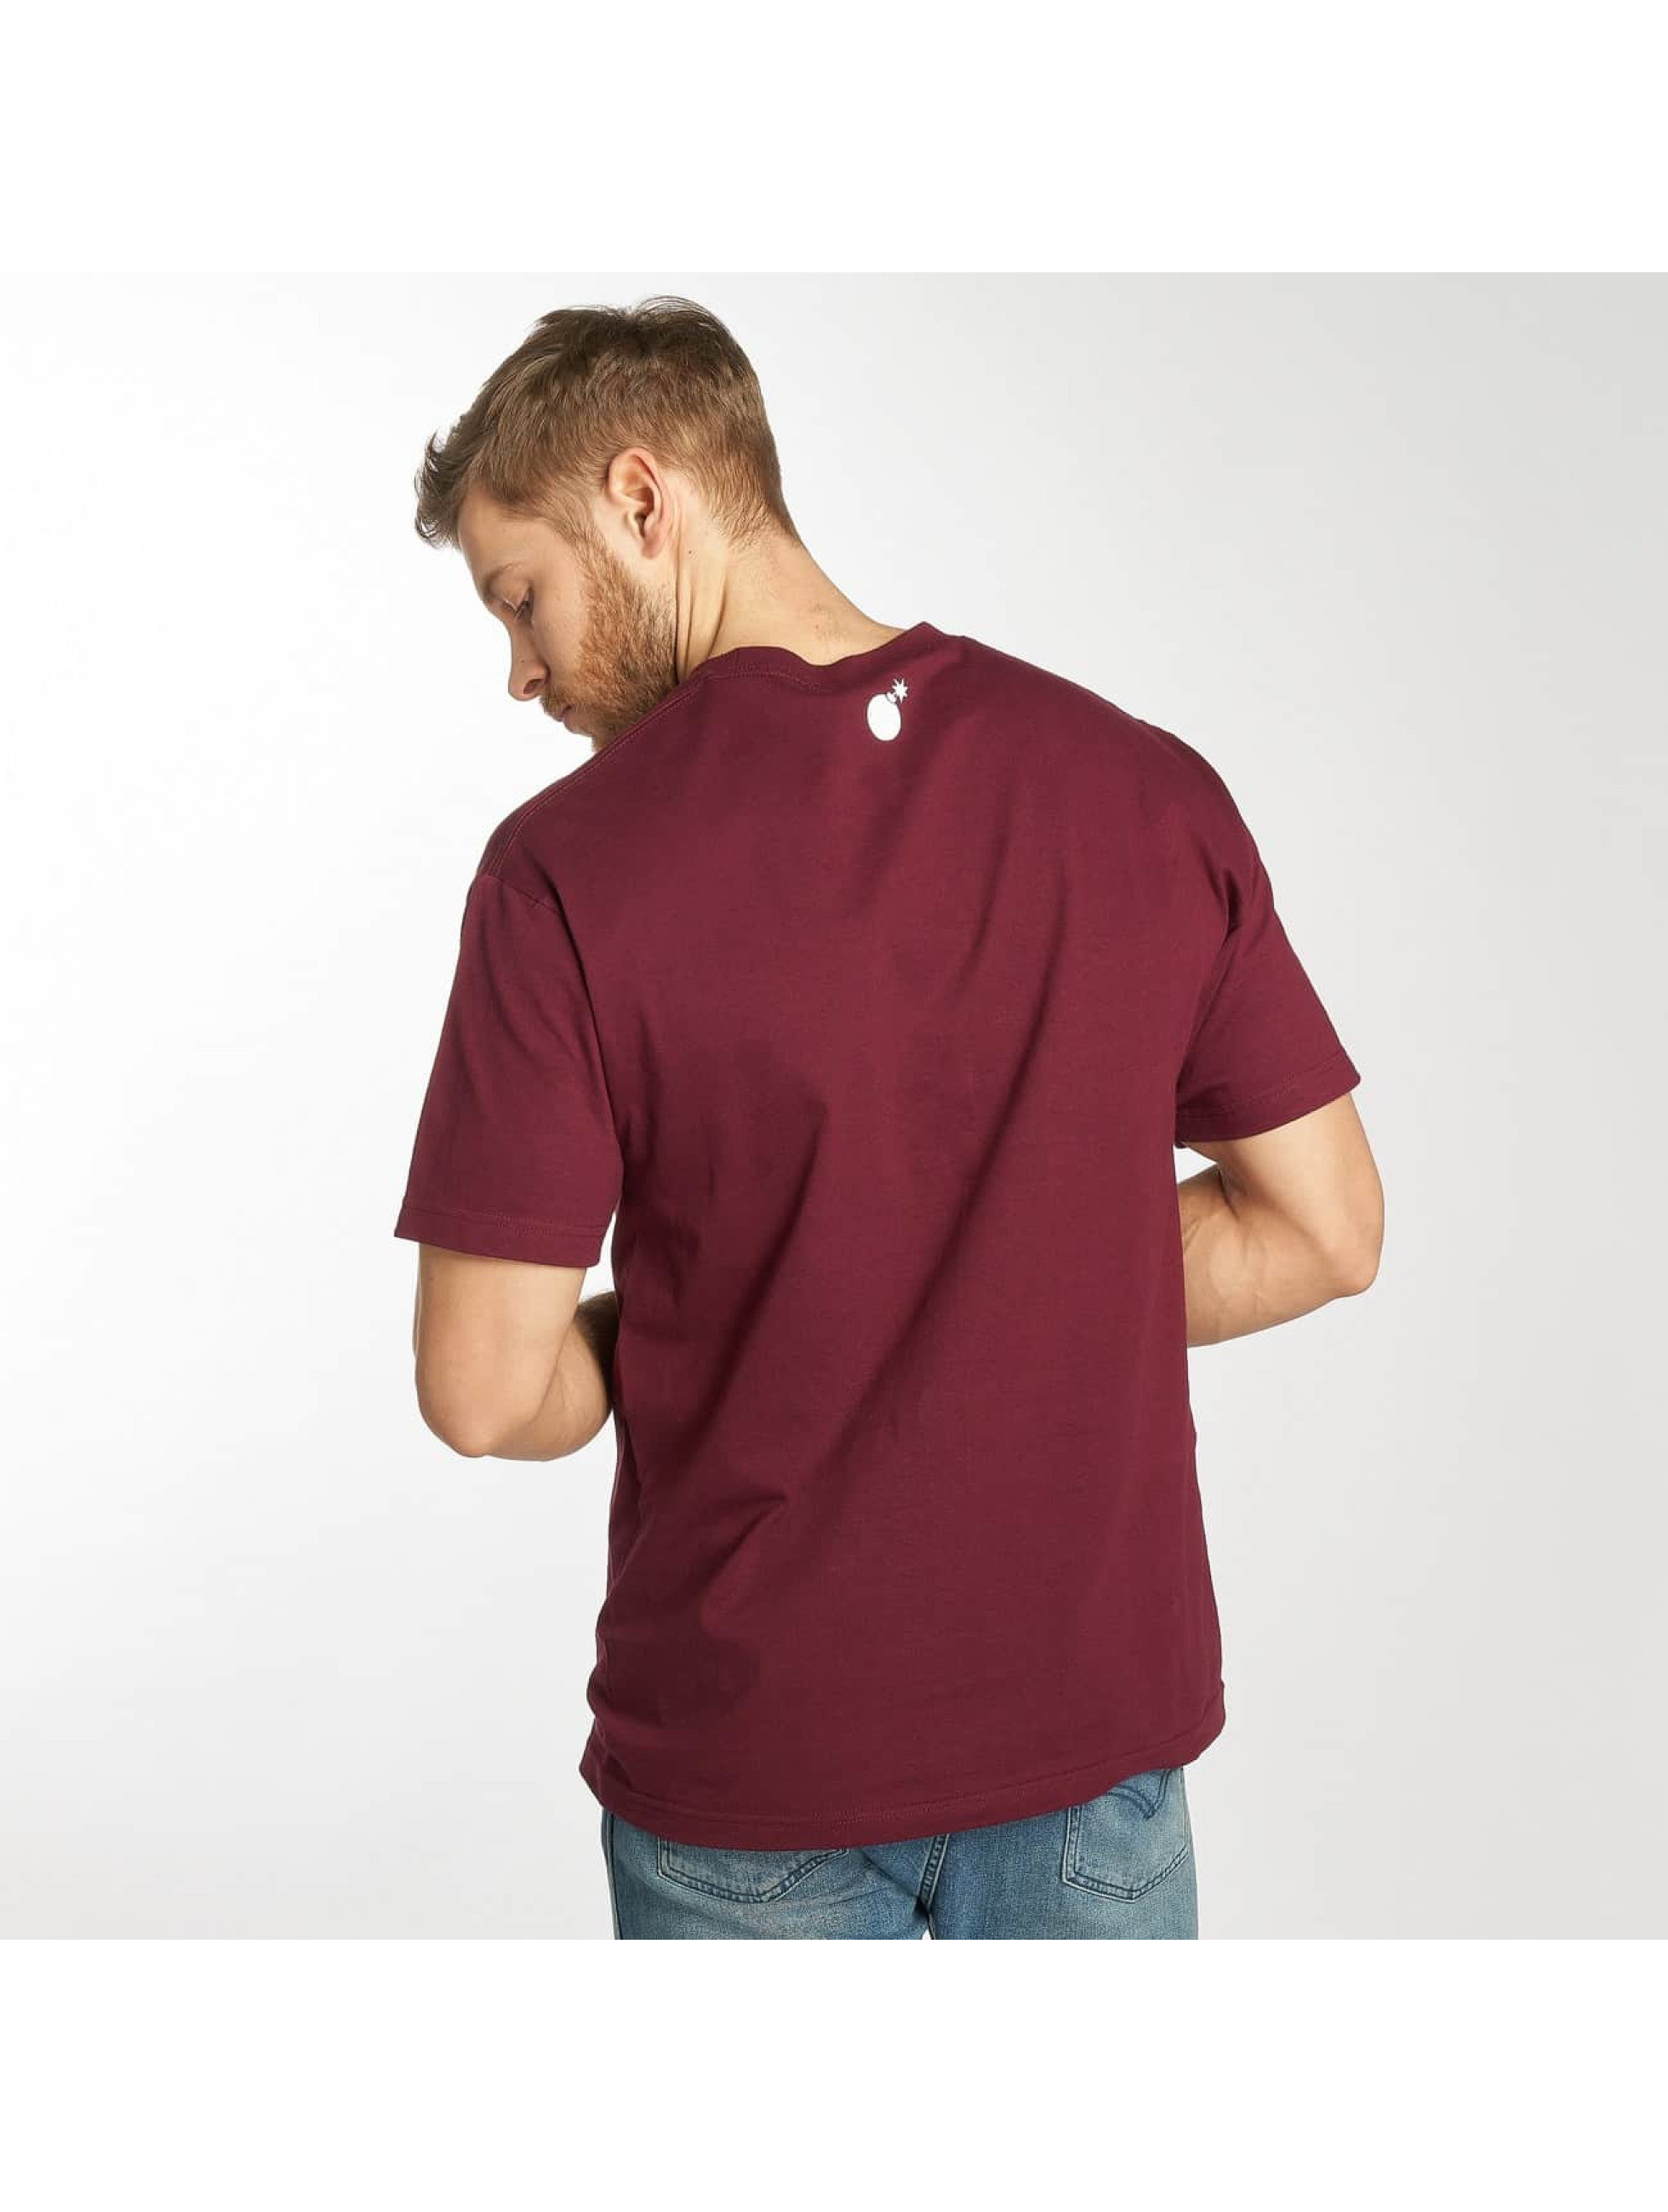 The Hundreds T-Shirt Dixon red